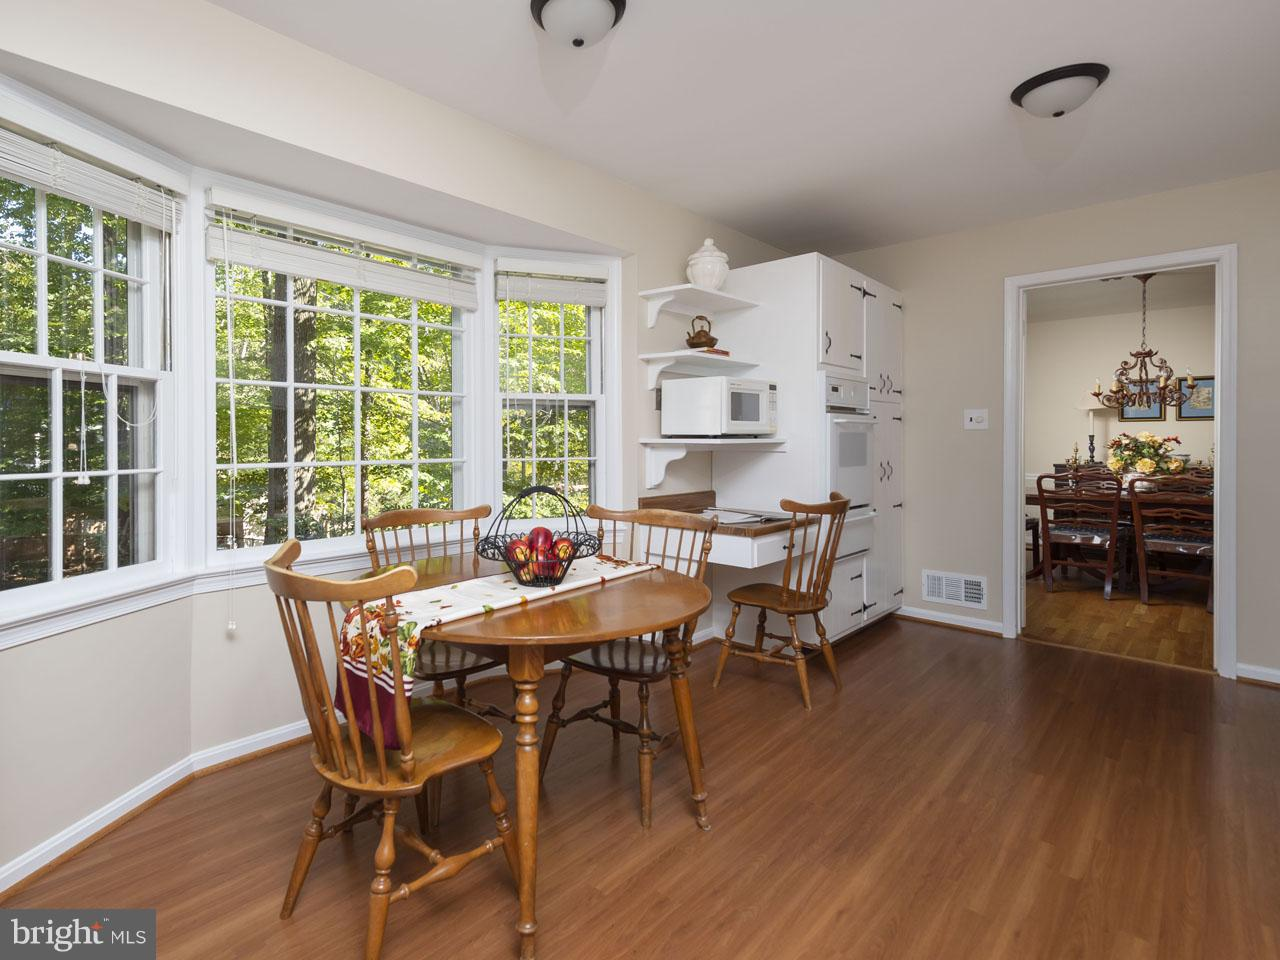 1010014728-300953034786-2021-09-05-13-50-25  |   | Annandale Delaware Real Estate For Sale | MLS# 1010014728  - Best of Northern Virginia